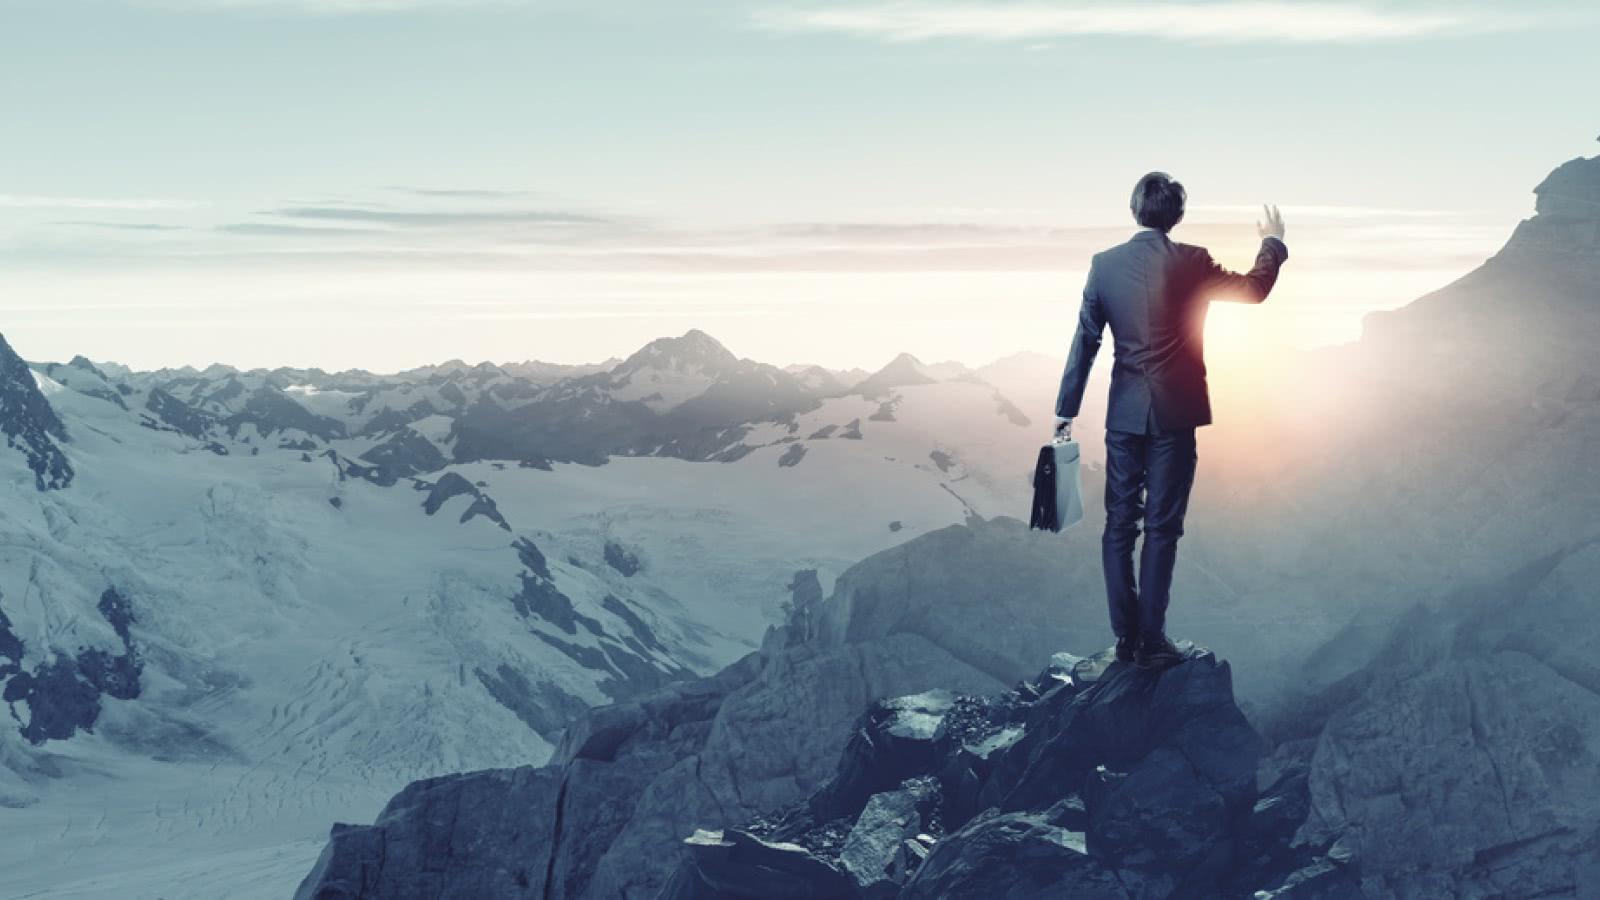 You & Alps visuel montagne